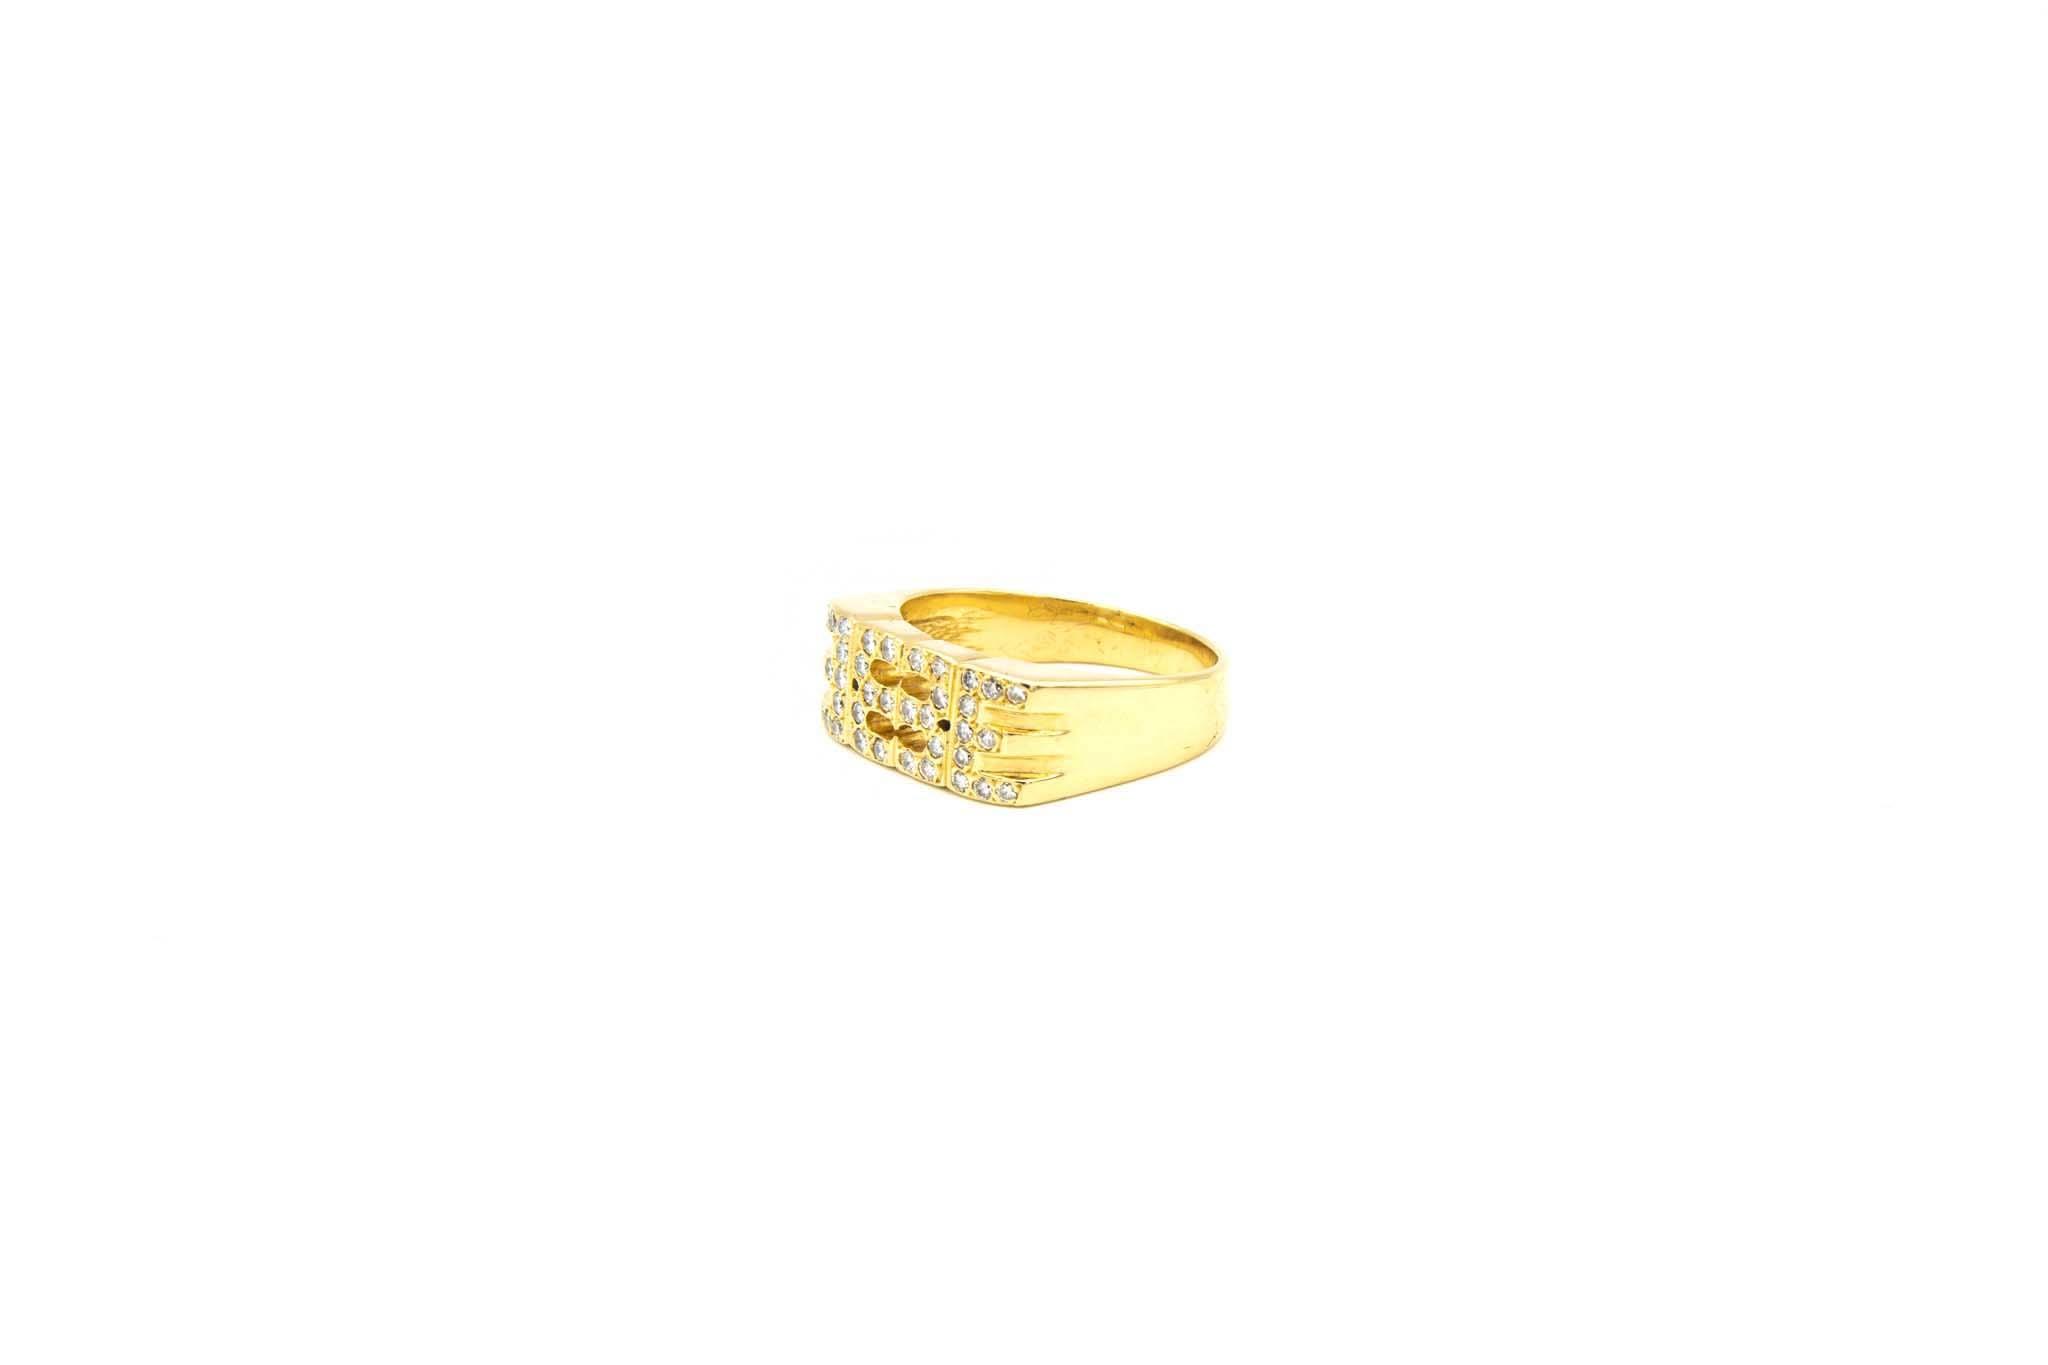 Ring fantasie opengewerkt met diamant-2